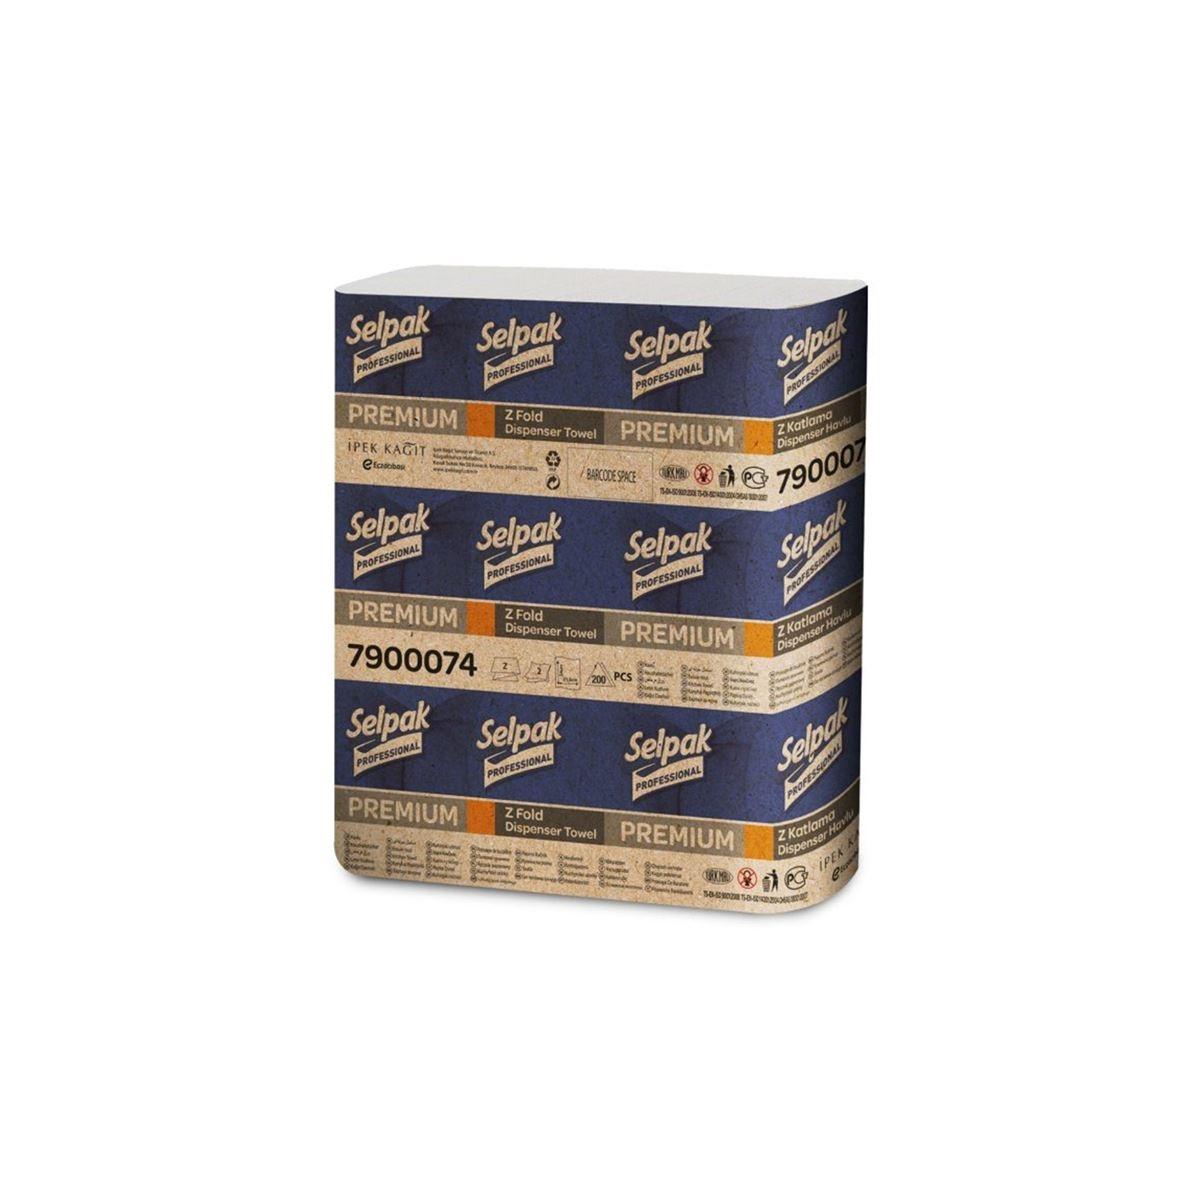 Selpak Professional Premium Z Katlama Dispenser Havlu 200*20 resmi